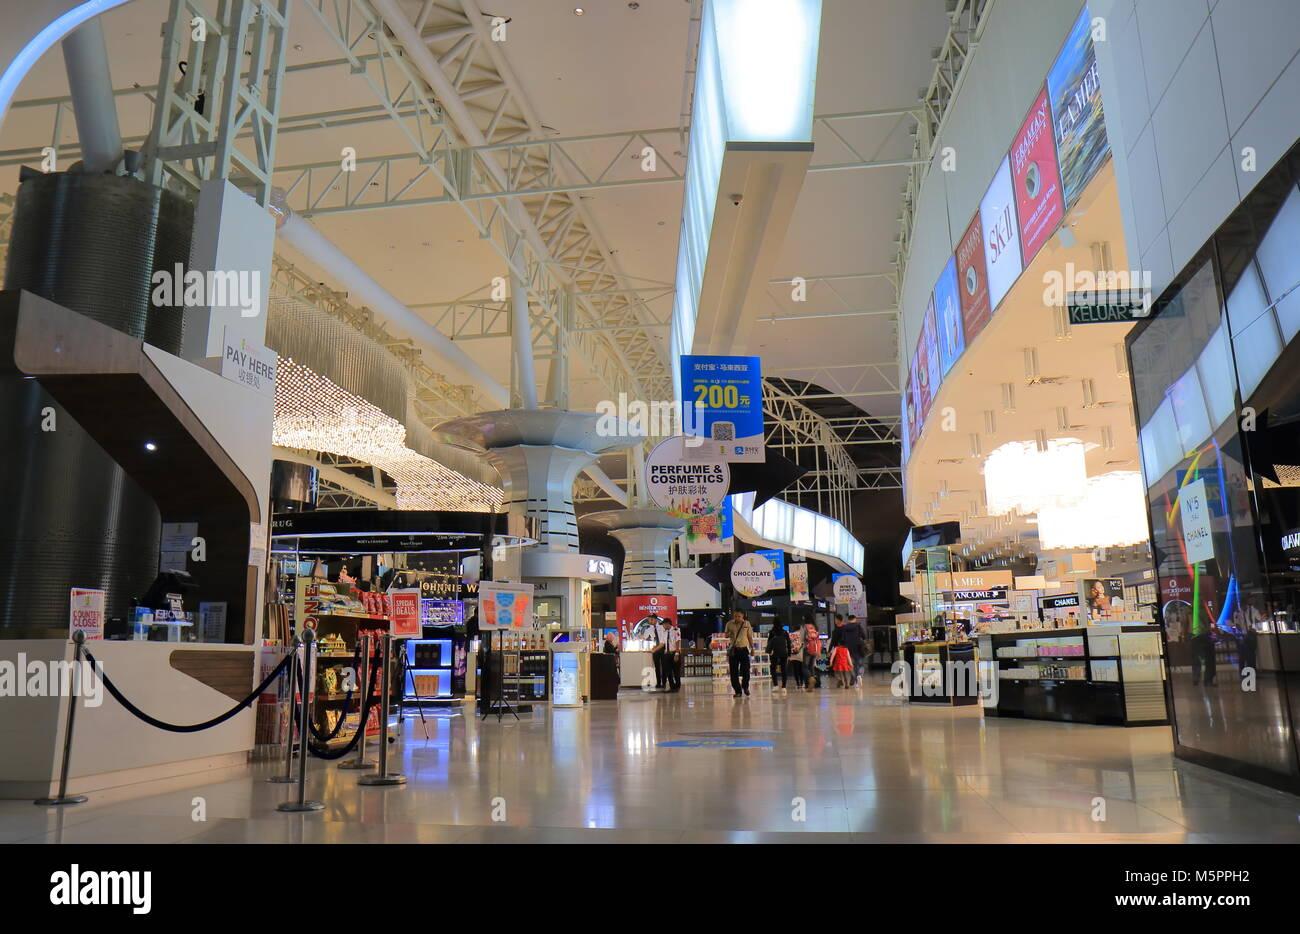 People visit duty free stores at Kuala Lumpur International Airport 2 Malaysia - Stock Image